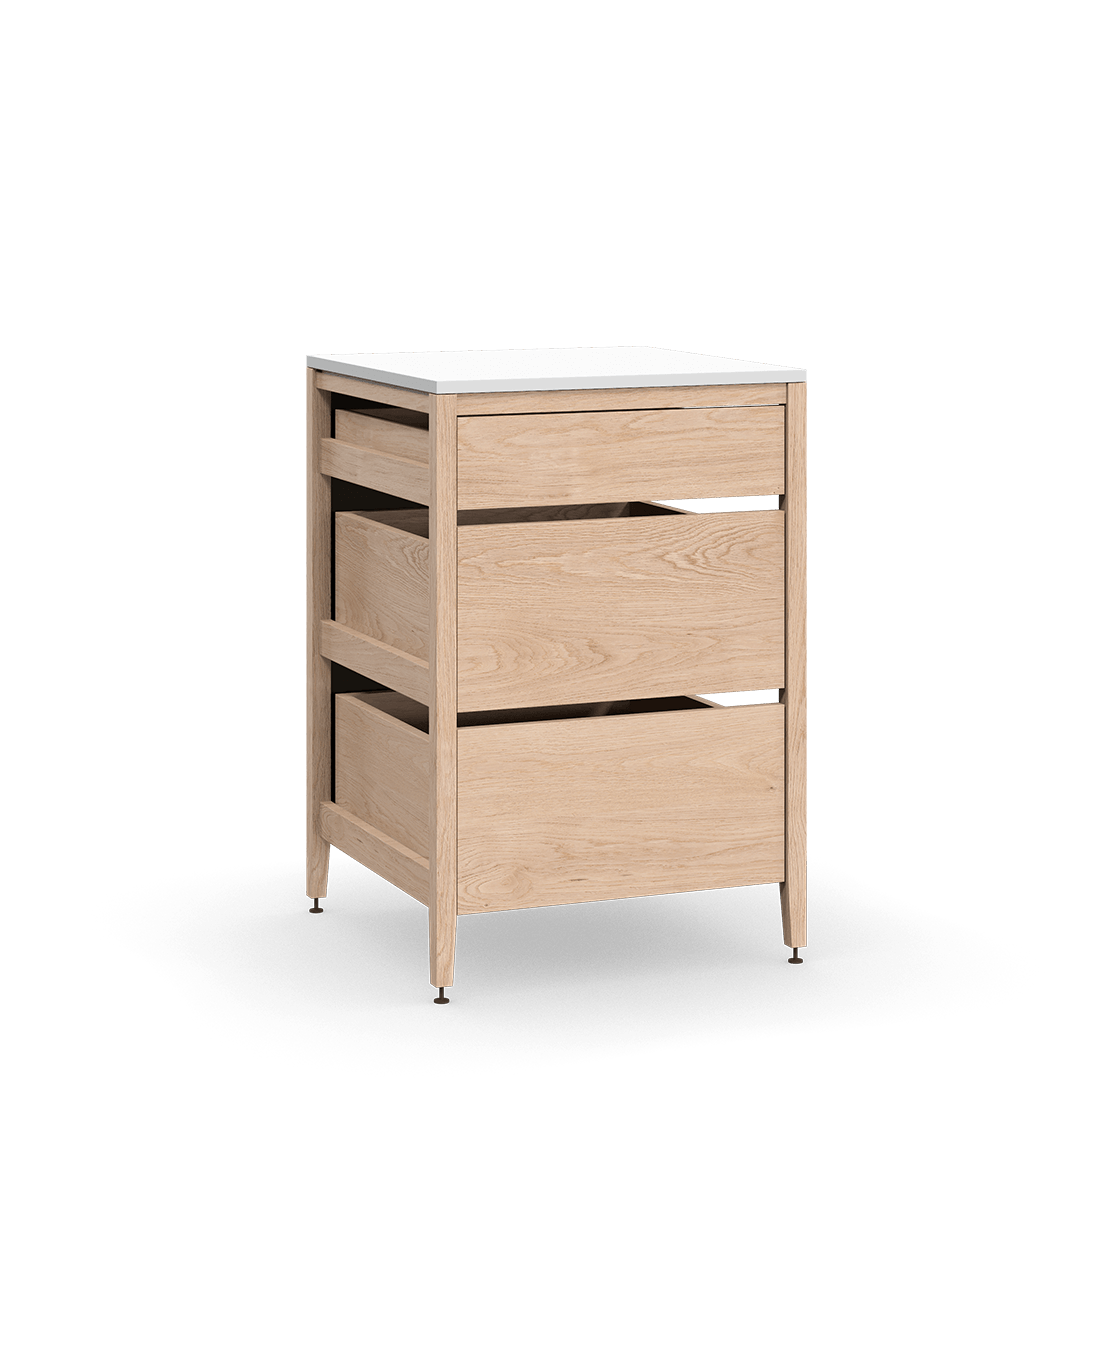 coquo radix white oak solid wood modular 3 drawers base kitchen cabinet 24 inch C1-C-24TB-3001-NA